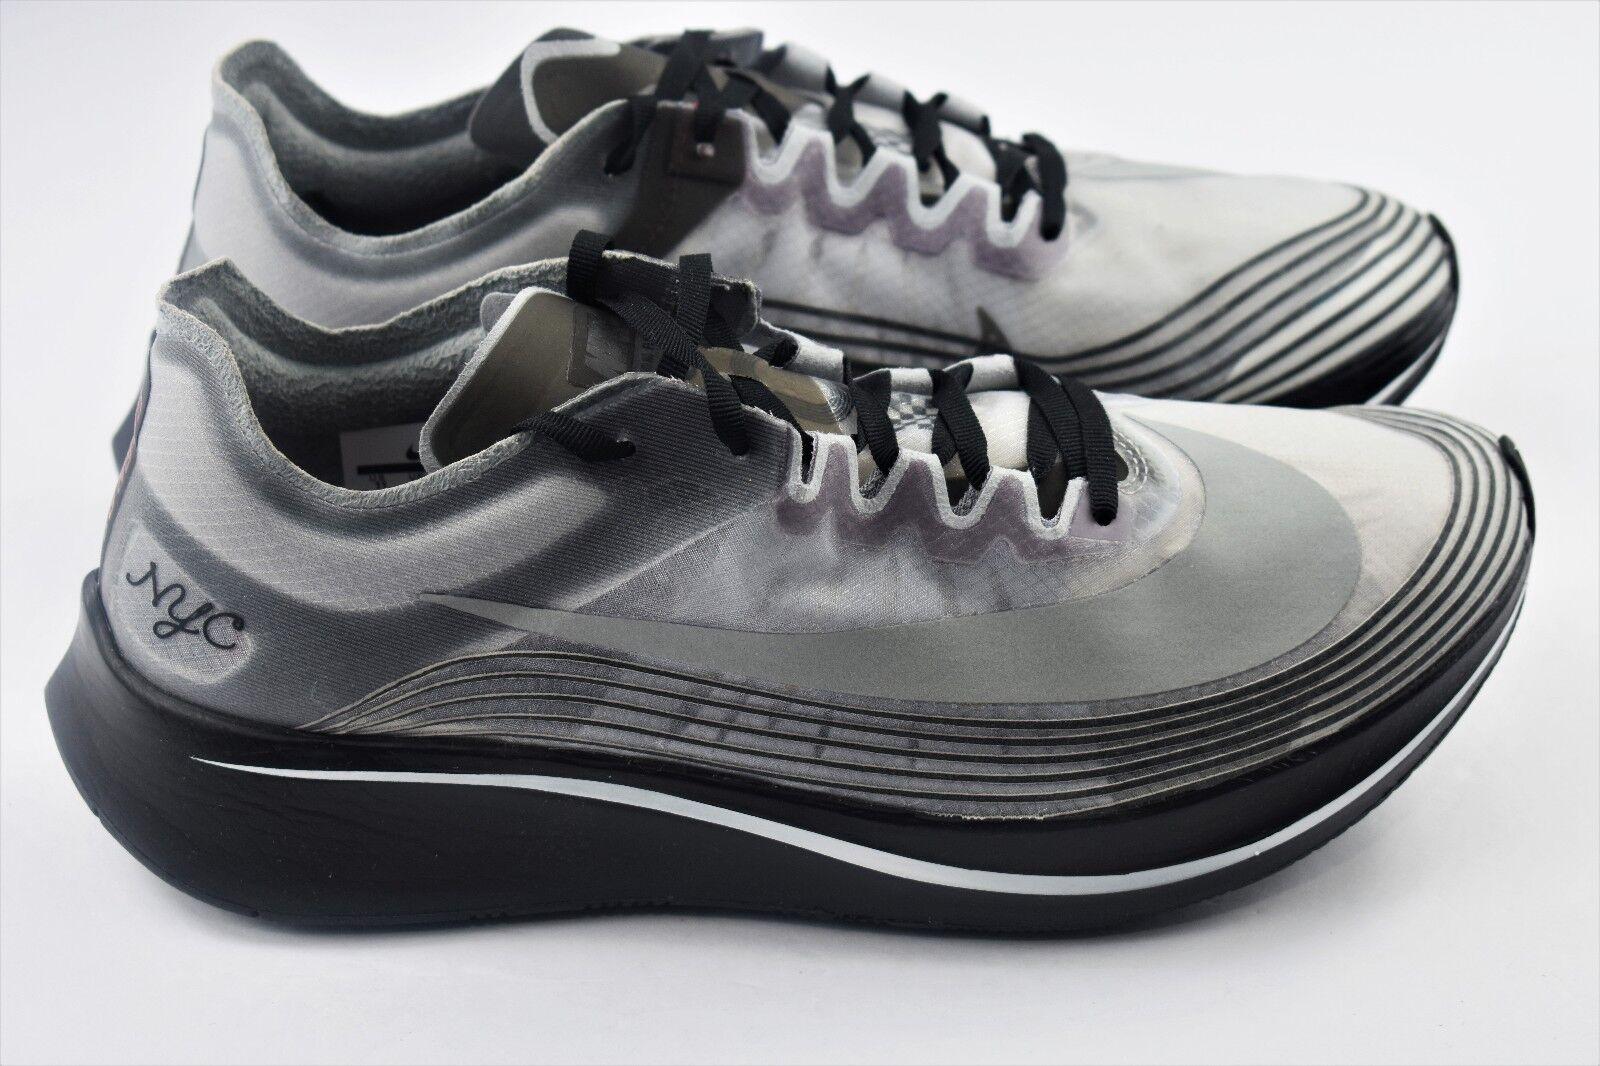 Nike air max goadome acg stivali bianchi chiaro fondo uomini sz 8 - 13